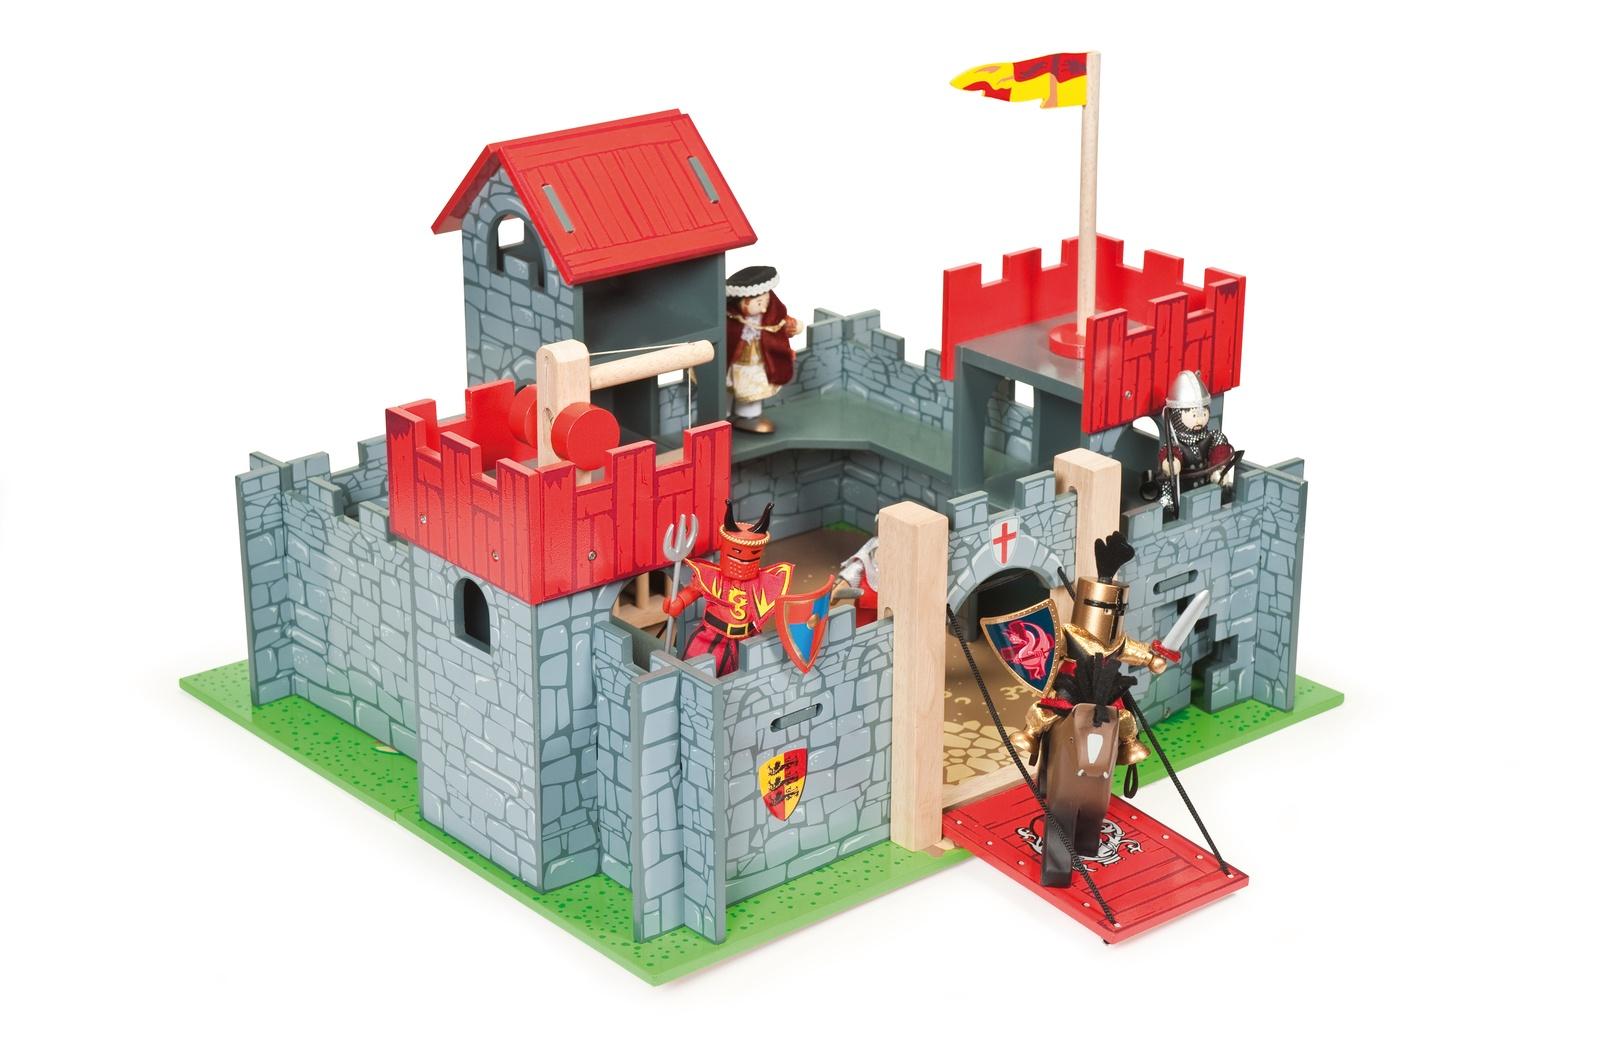 Рыцарский замок игрушка для фигурок Камелот, Le Toy Van цена